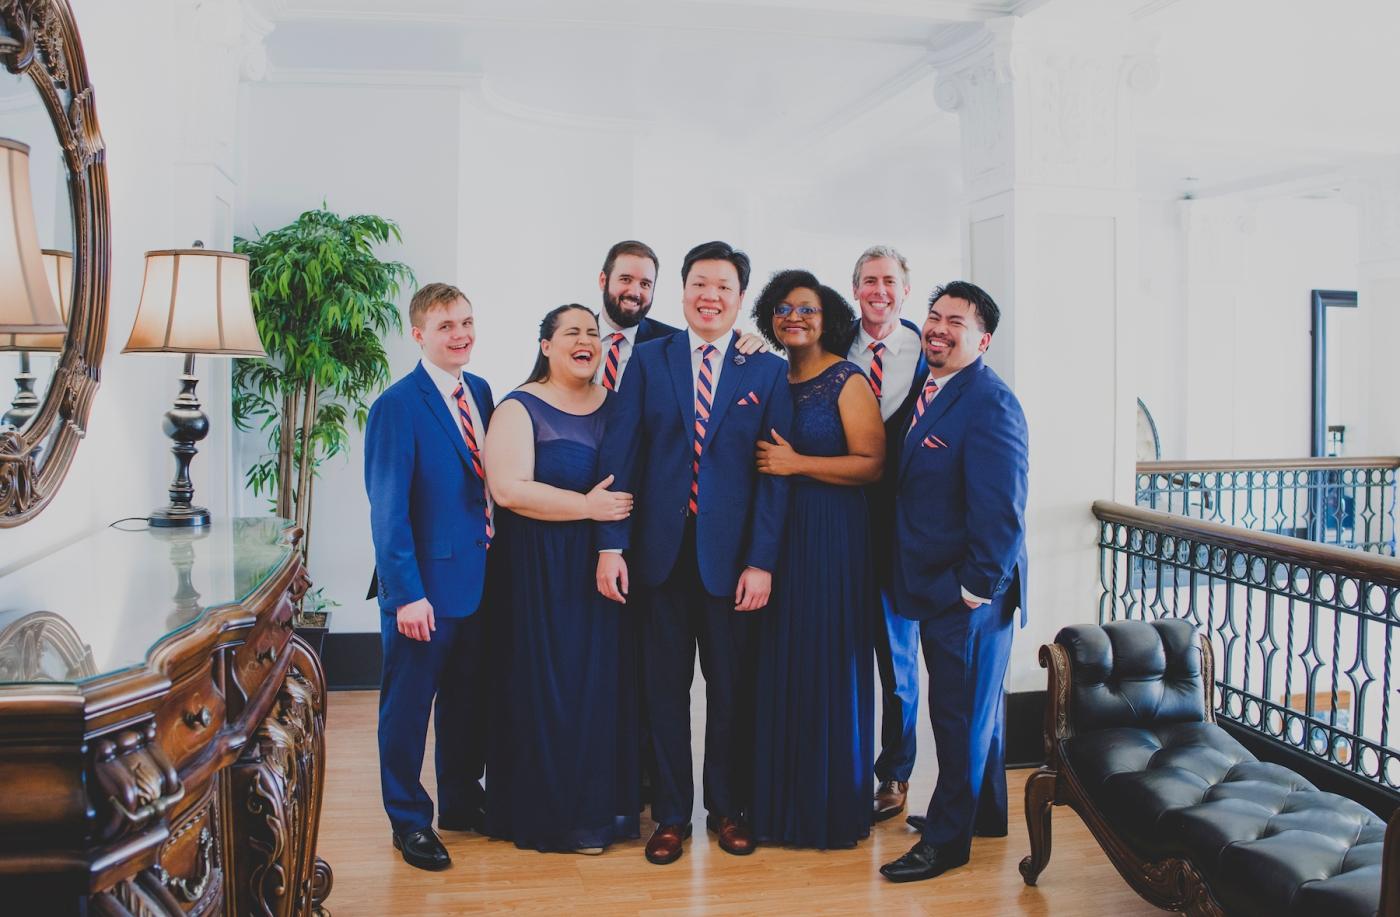 DSC_1992Everett_Wedding_Ballroom_Jane_Speleers_photography_Rachel_and_Edmund_Getting_ready_2017